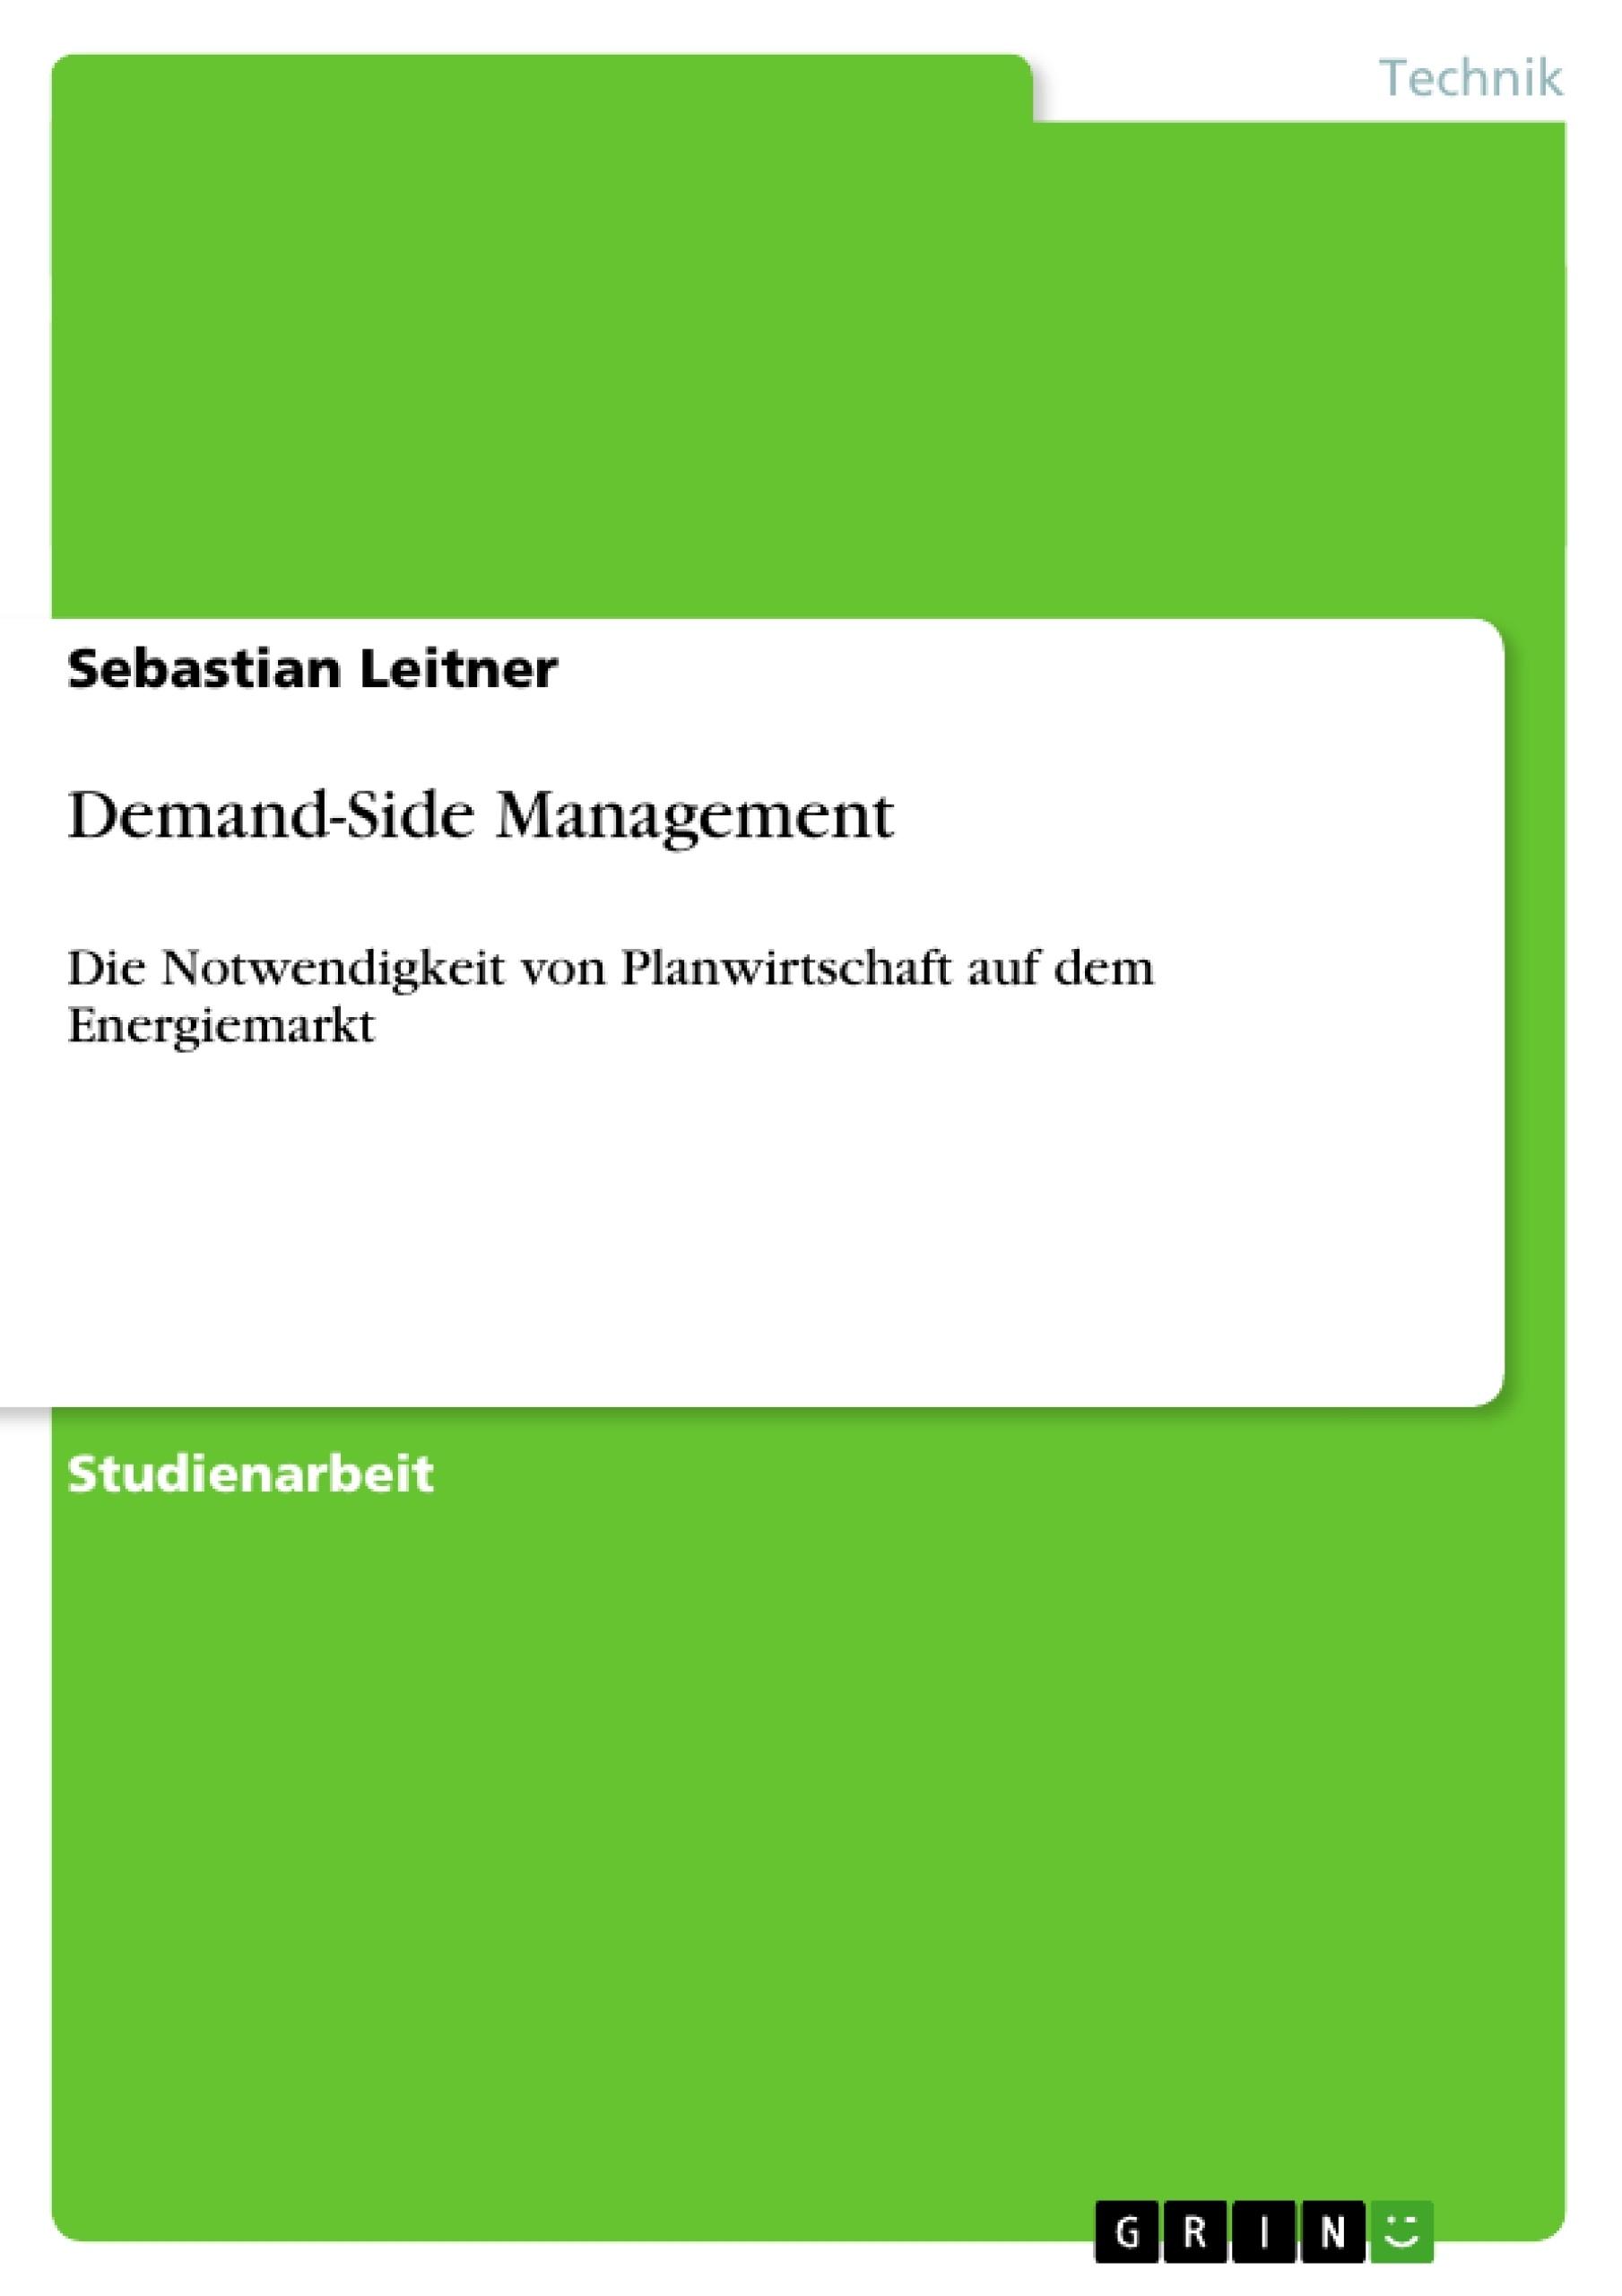 Titel: Demand-Side Management